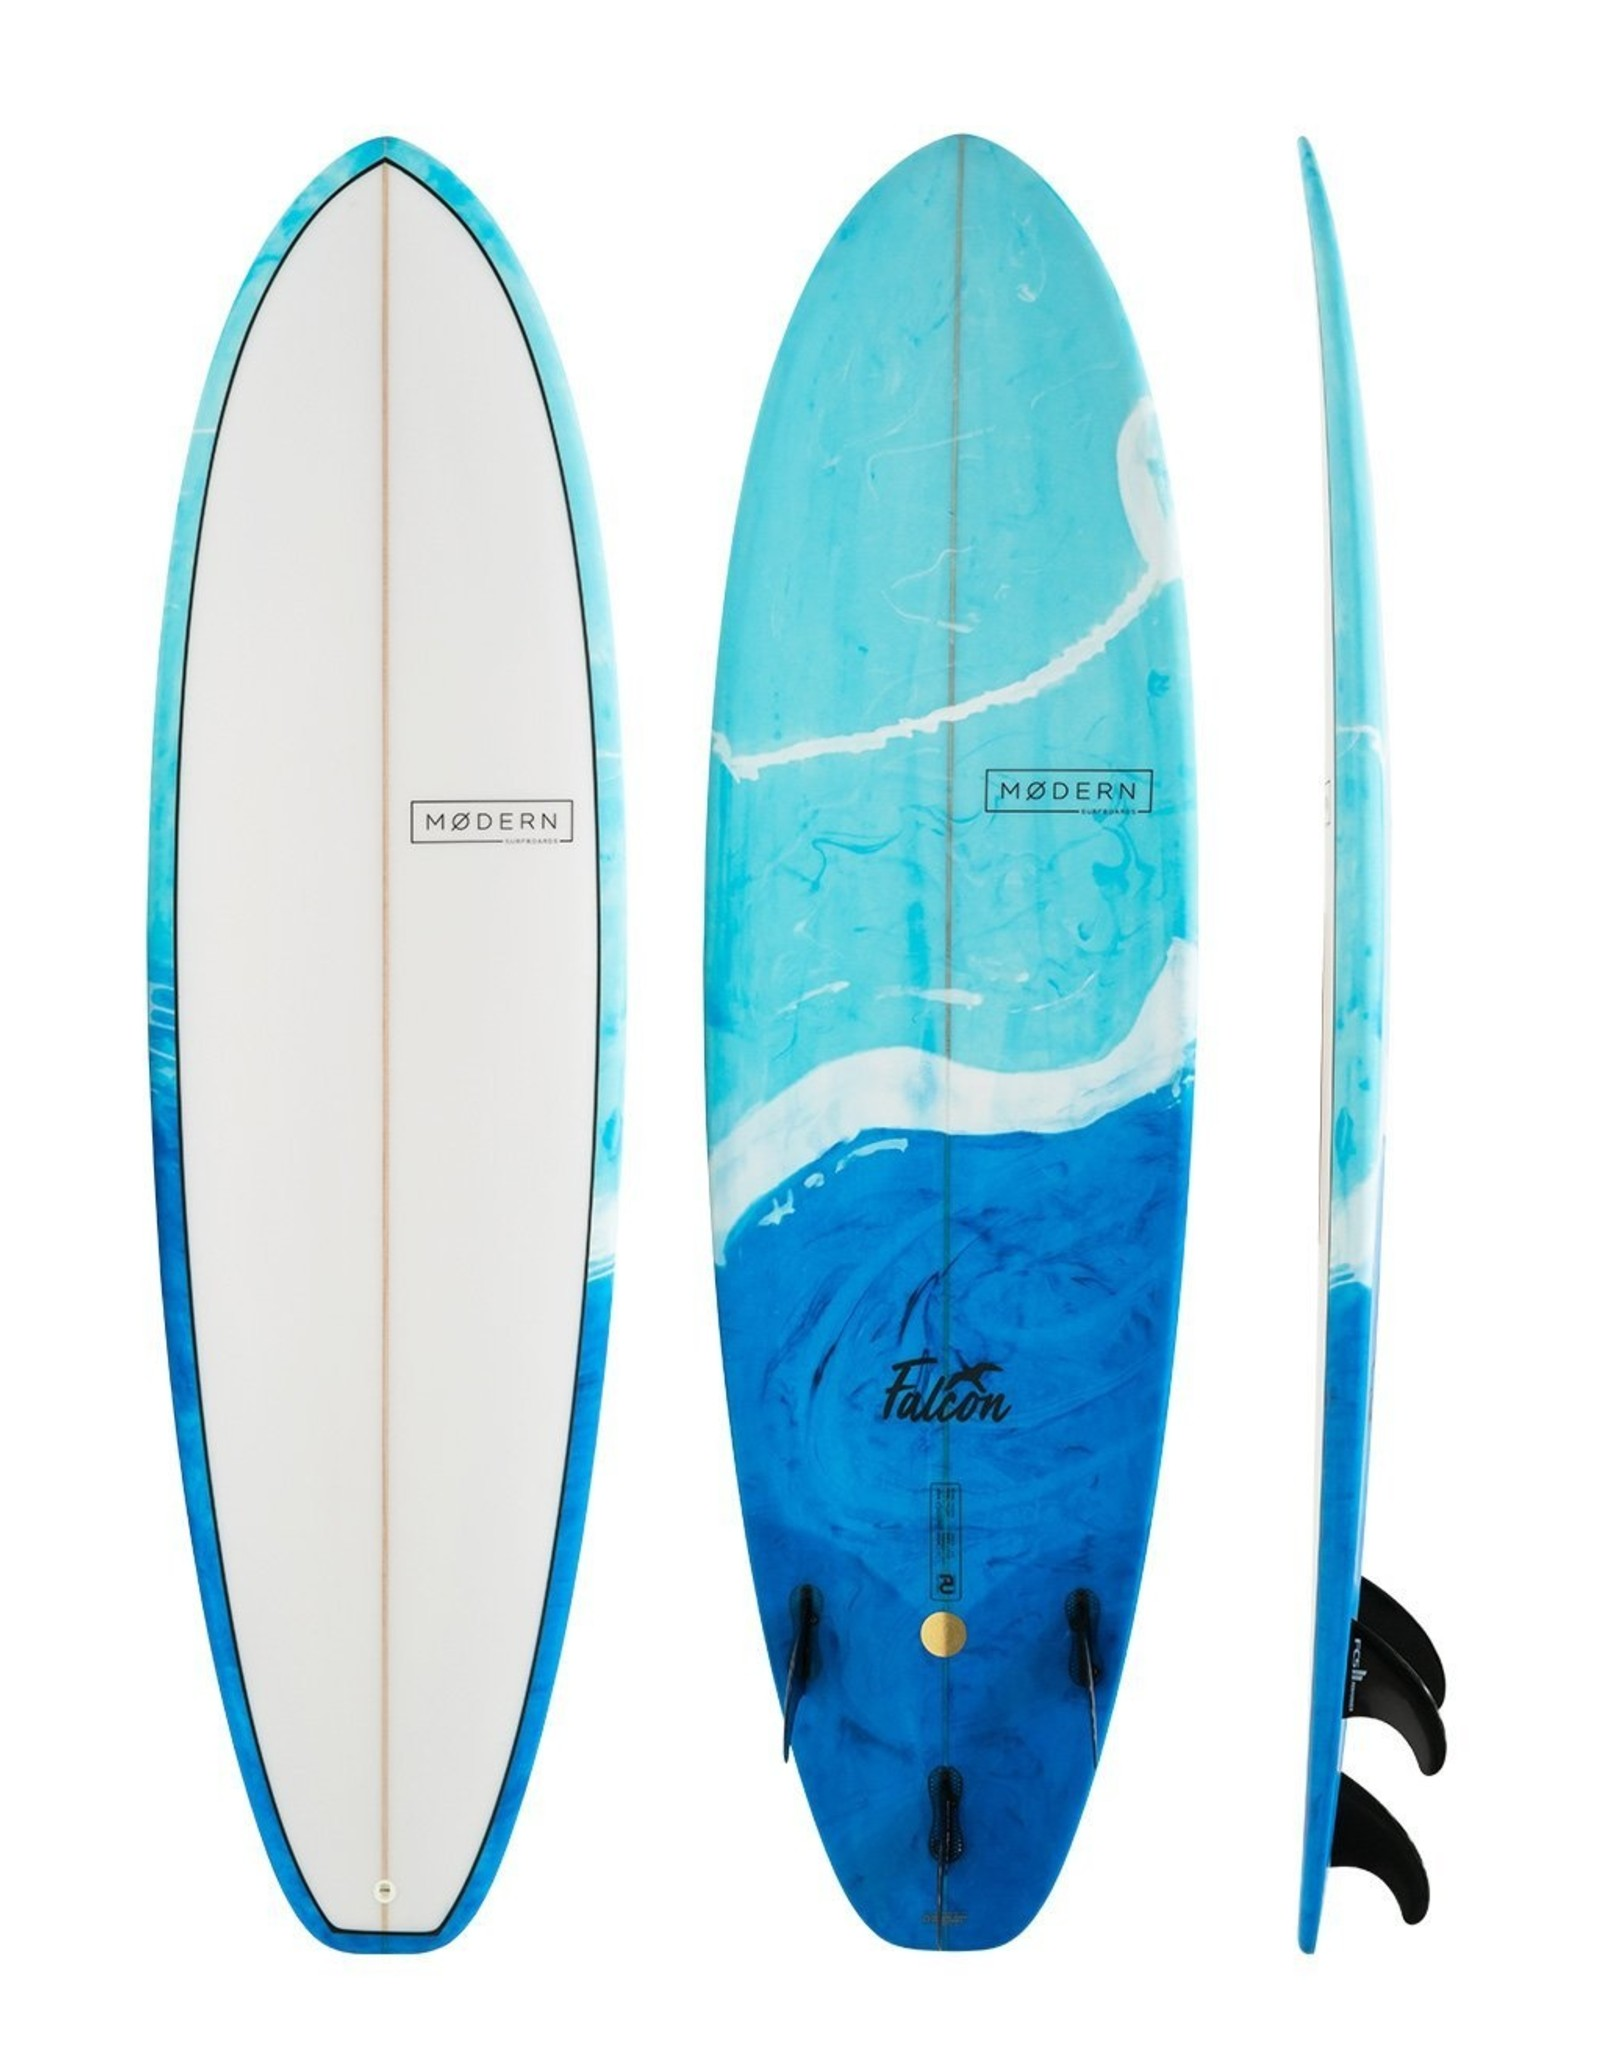 Modern Surfboards 7'0 MODERN Falcon PU Blue Swirl Tint